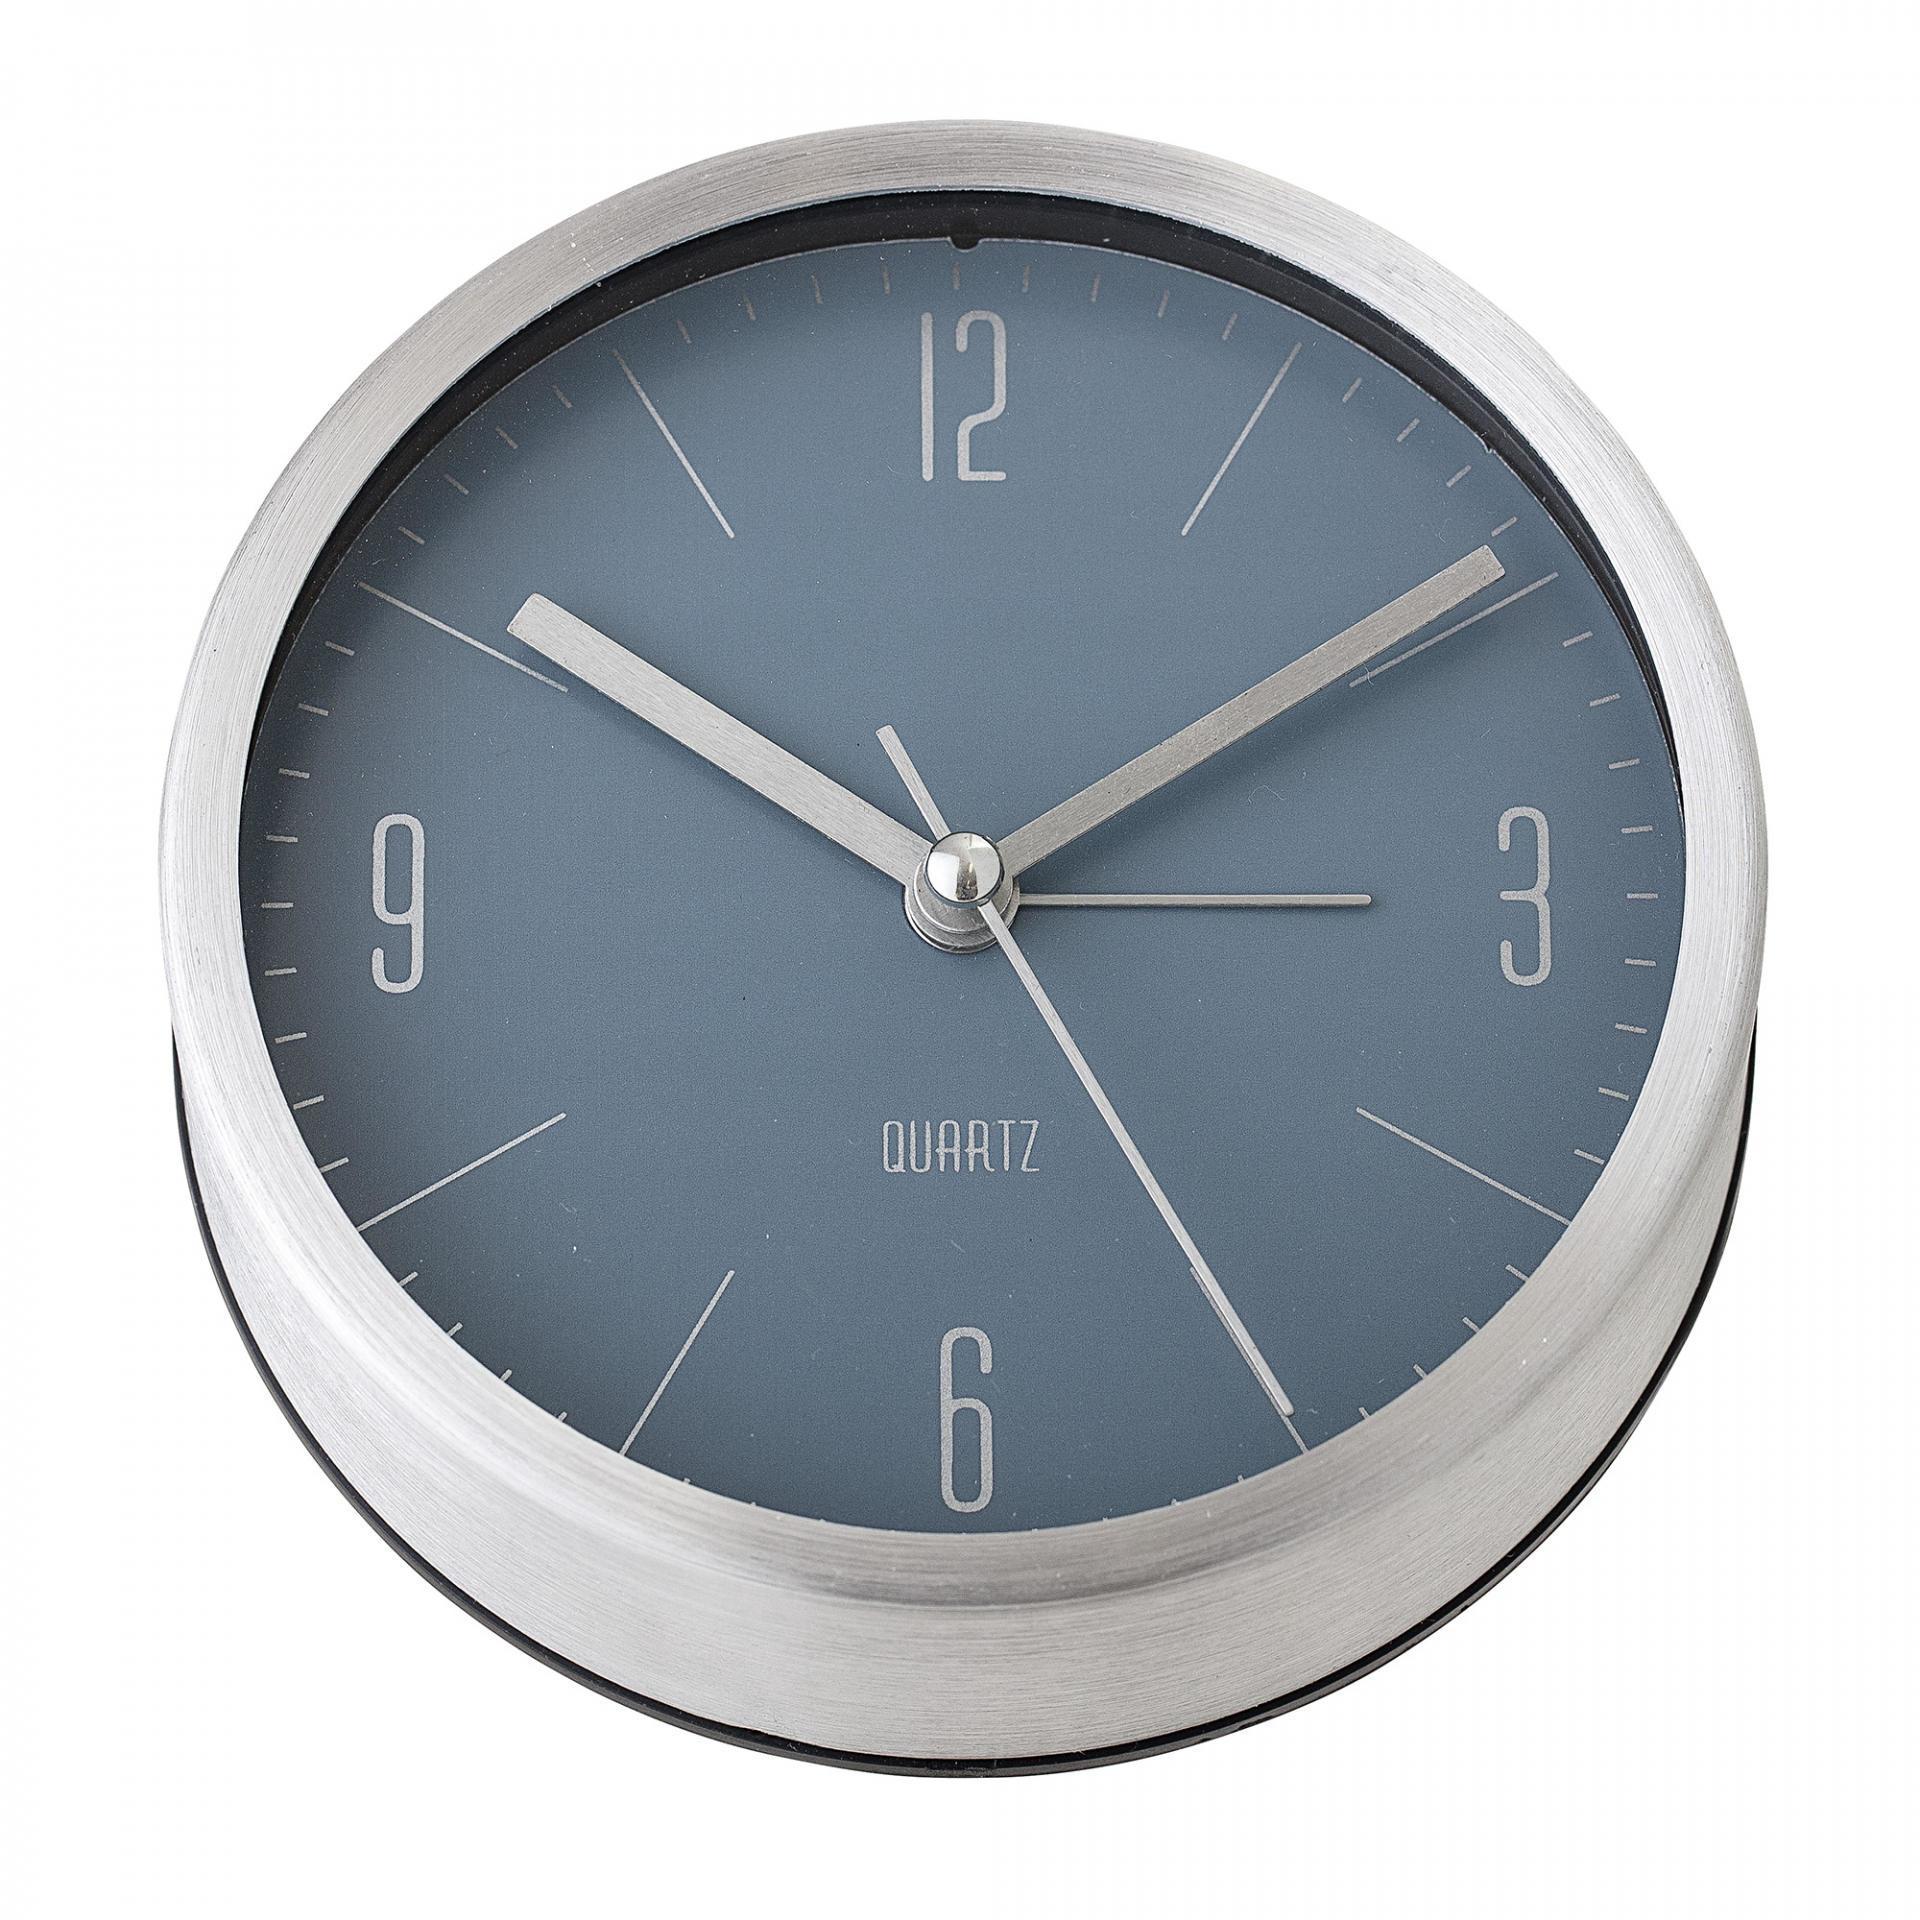 Bloomingville Stolní hodiny Silver Aluminium, šedá barva, stříbrná barva, sklo, kov